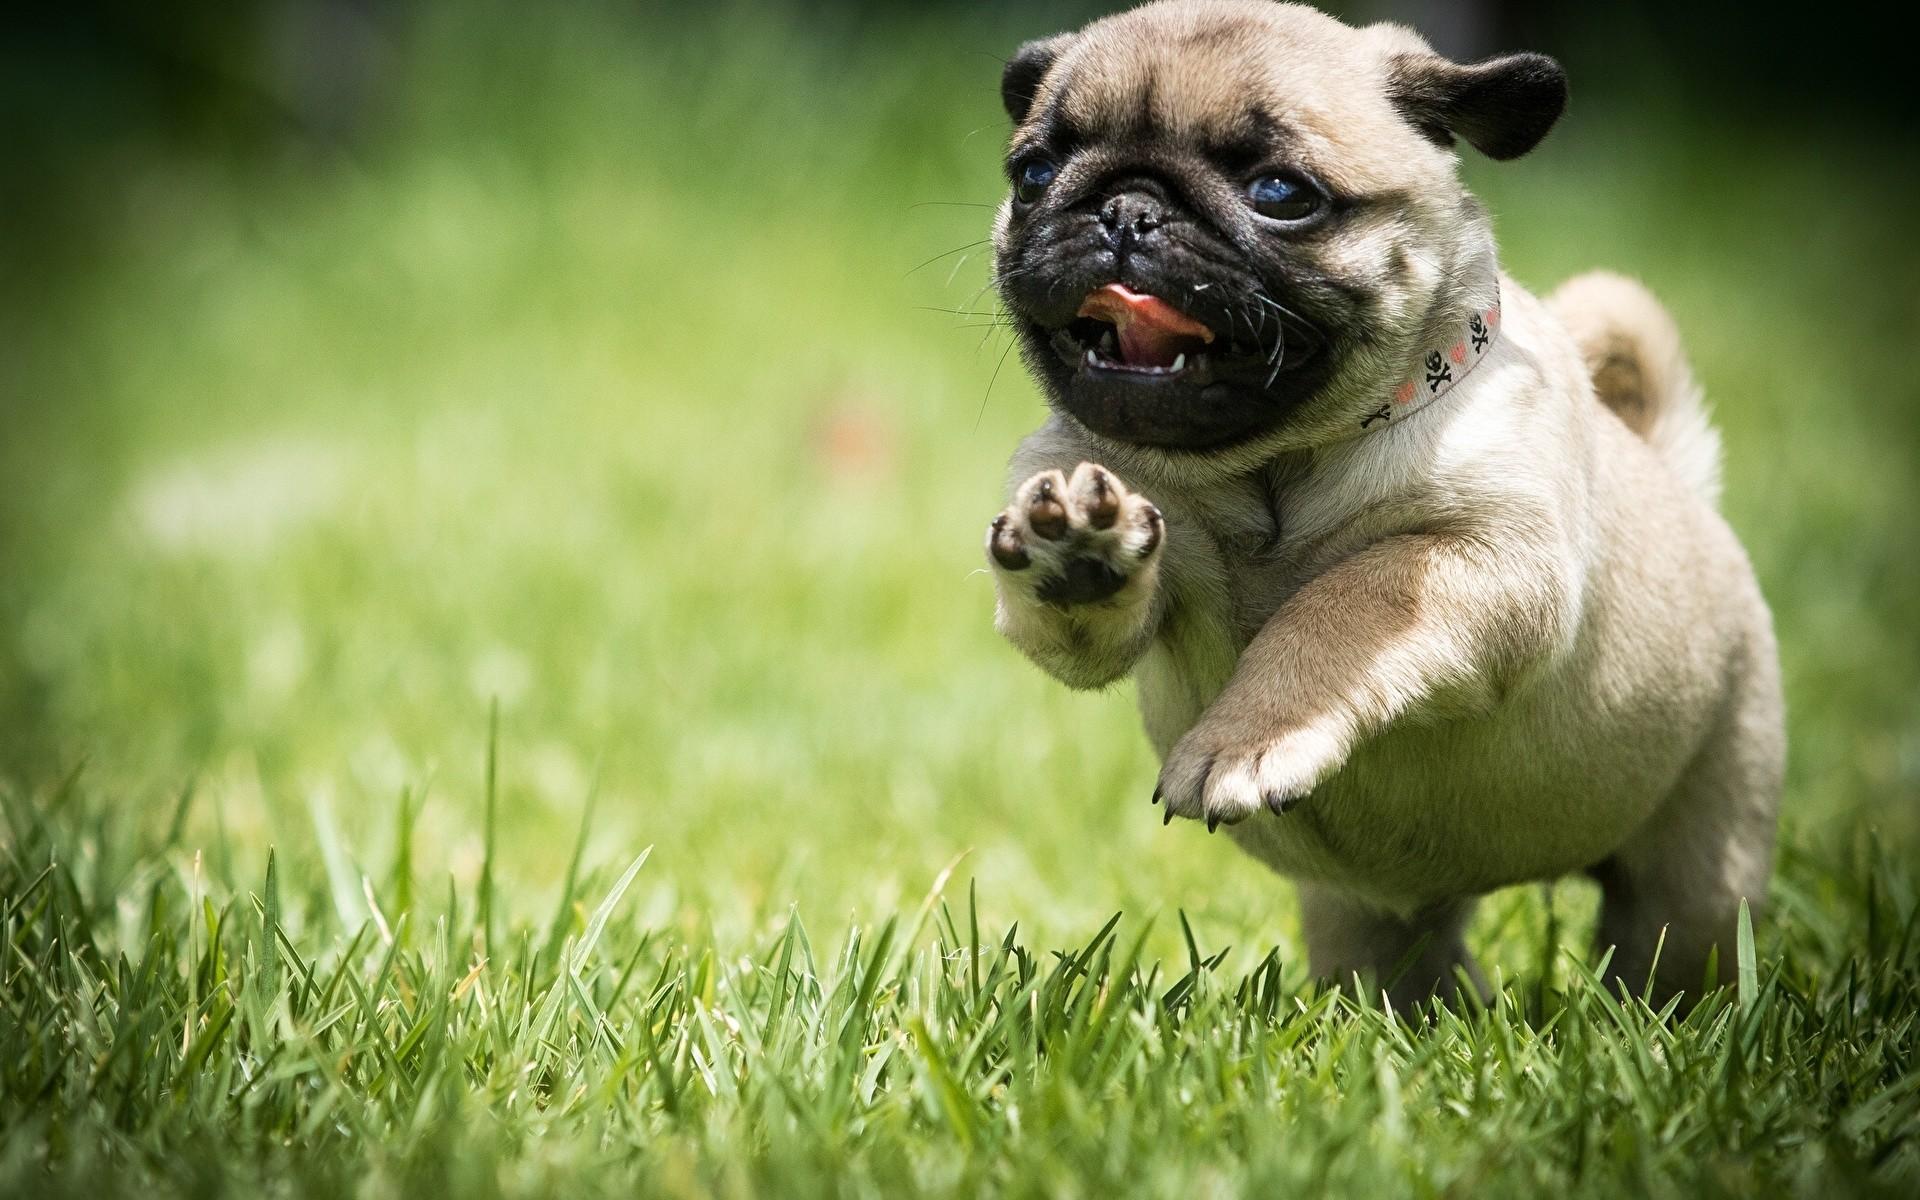 1080x1920 Cute Pugs Puppies IPhone 6 Wallpaper HD